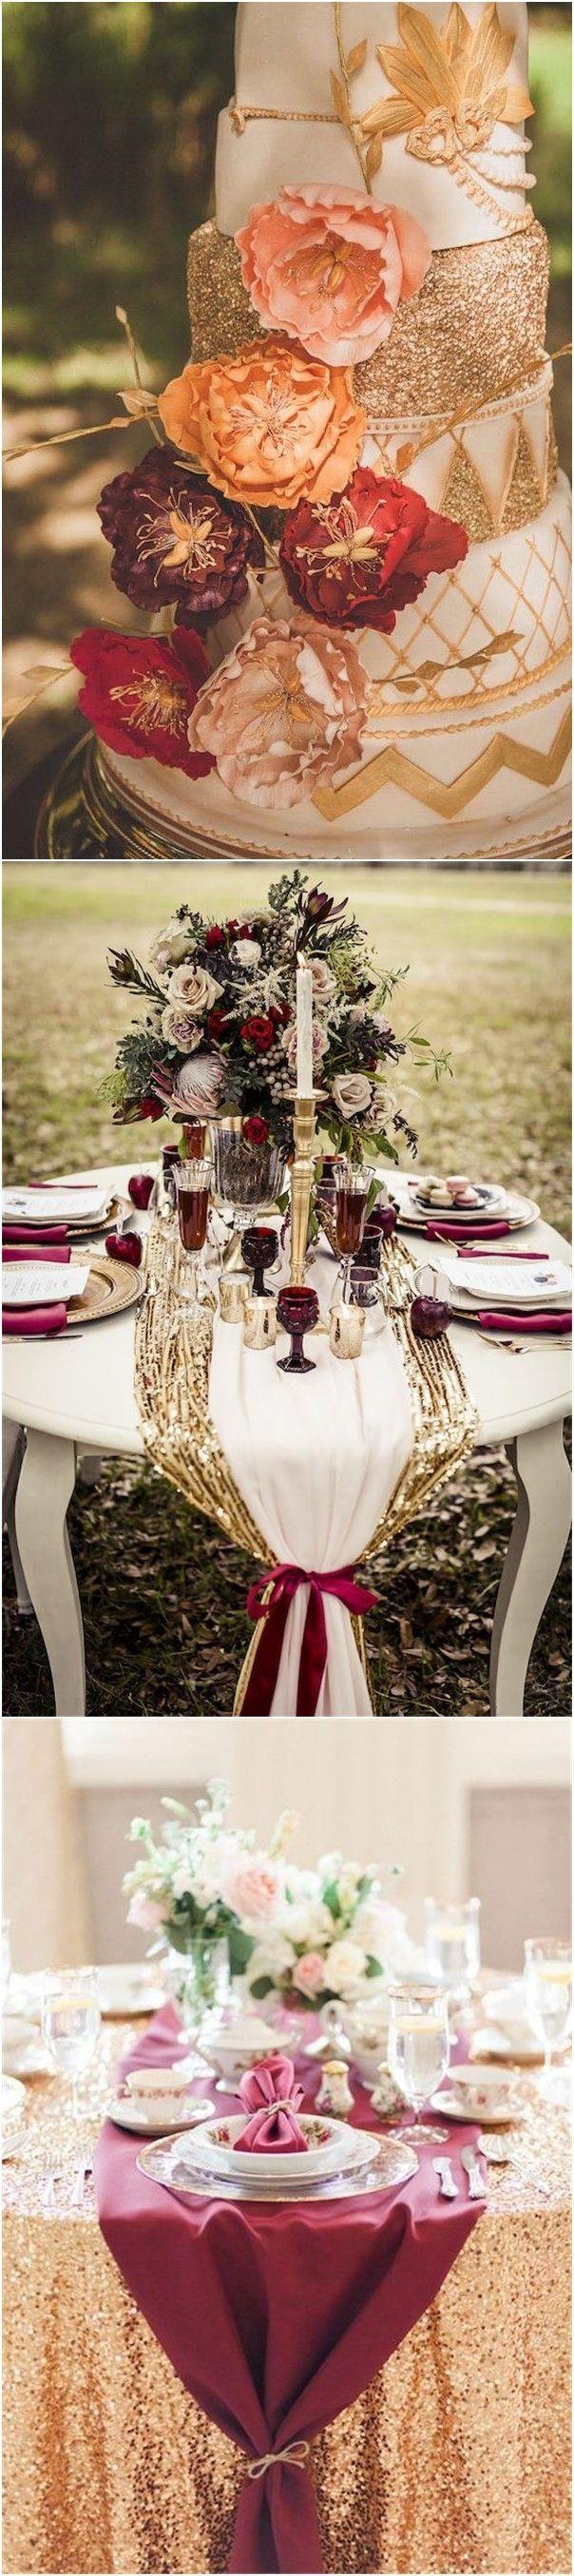 Wedding decoration ideas burgundy   Romantic Burgundy and Rose Gold Fall Wedding Ideas  Romantic